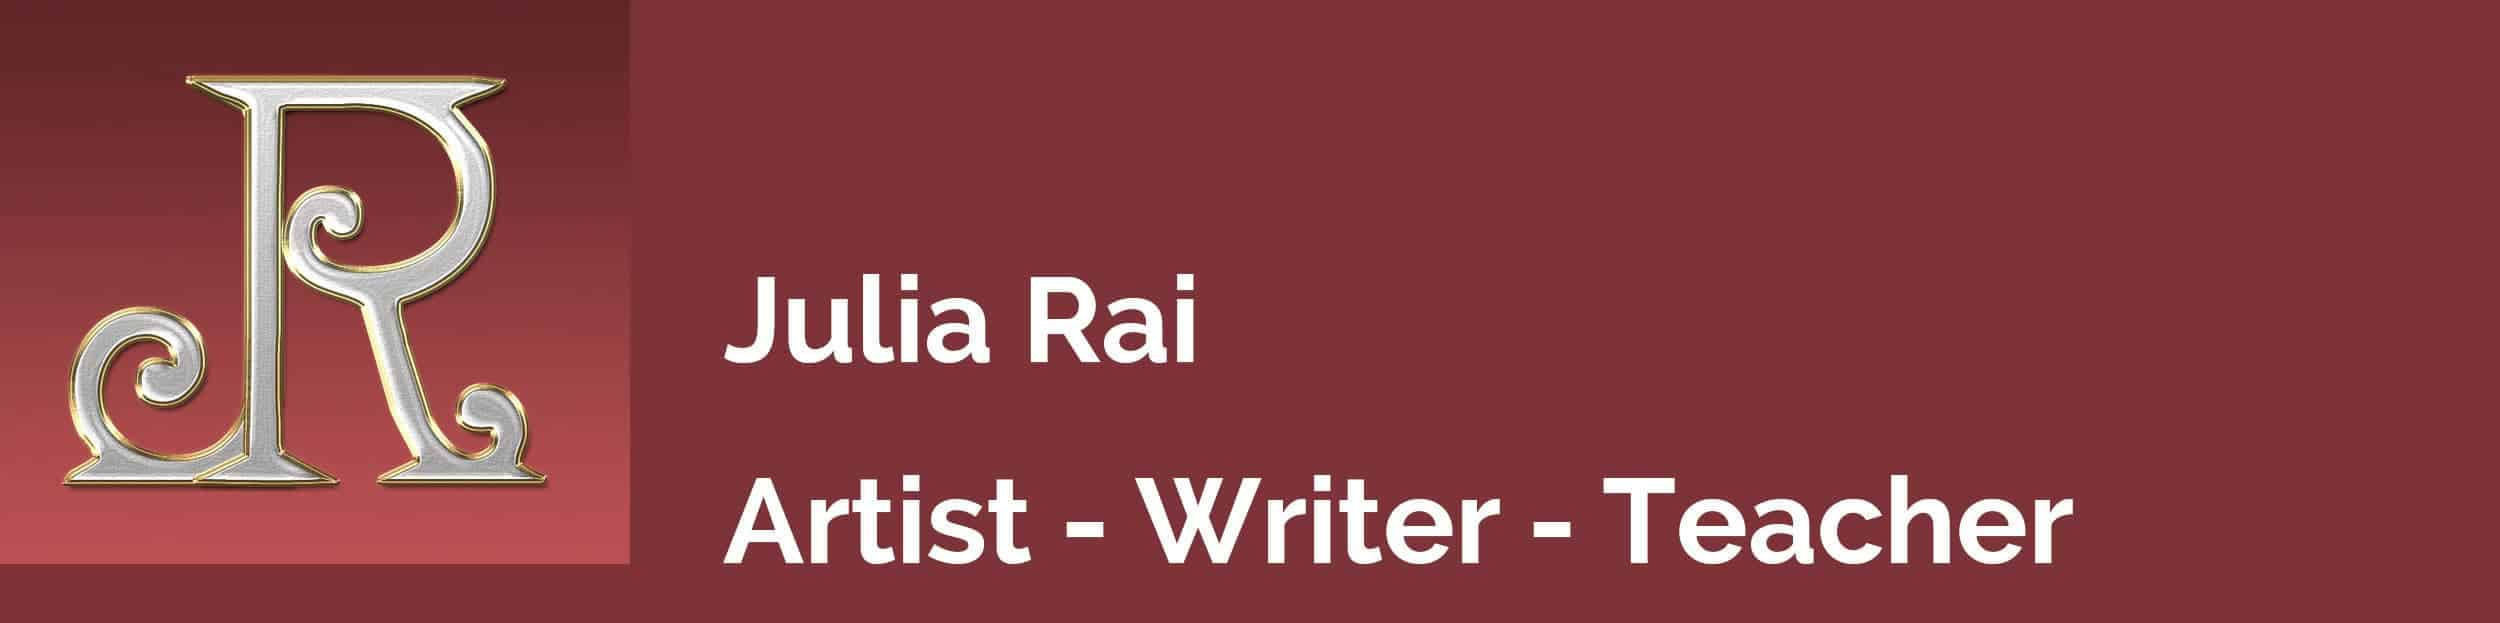 Julia Rai